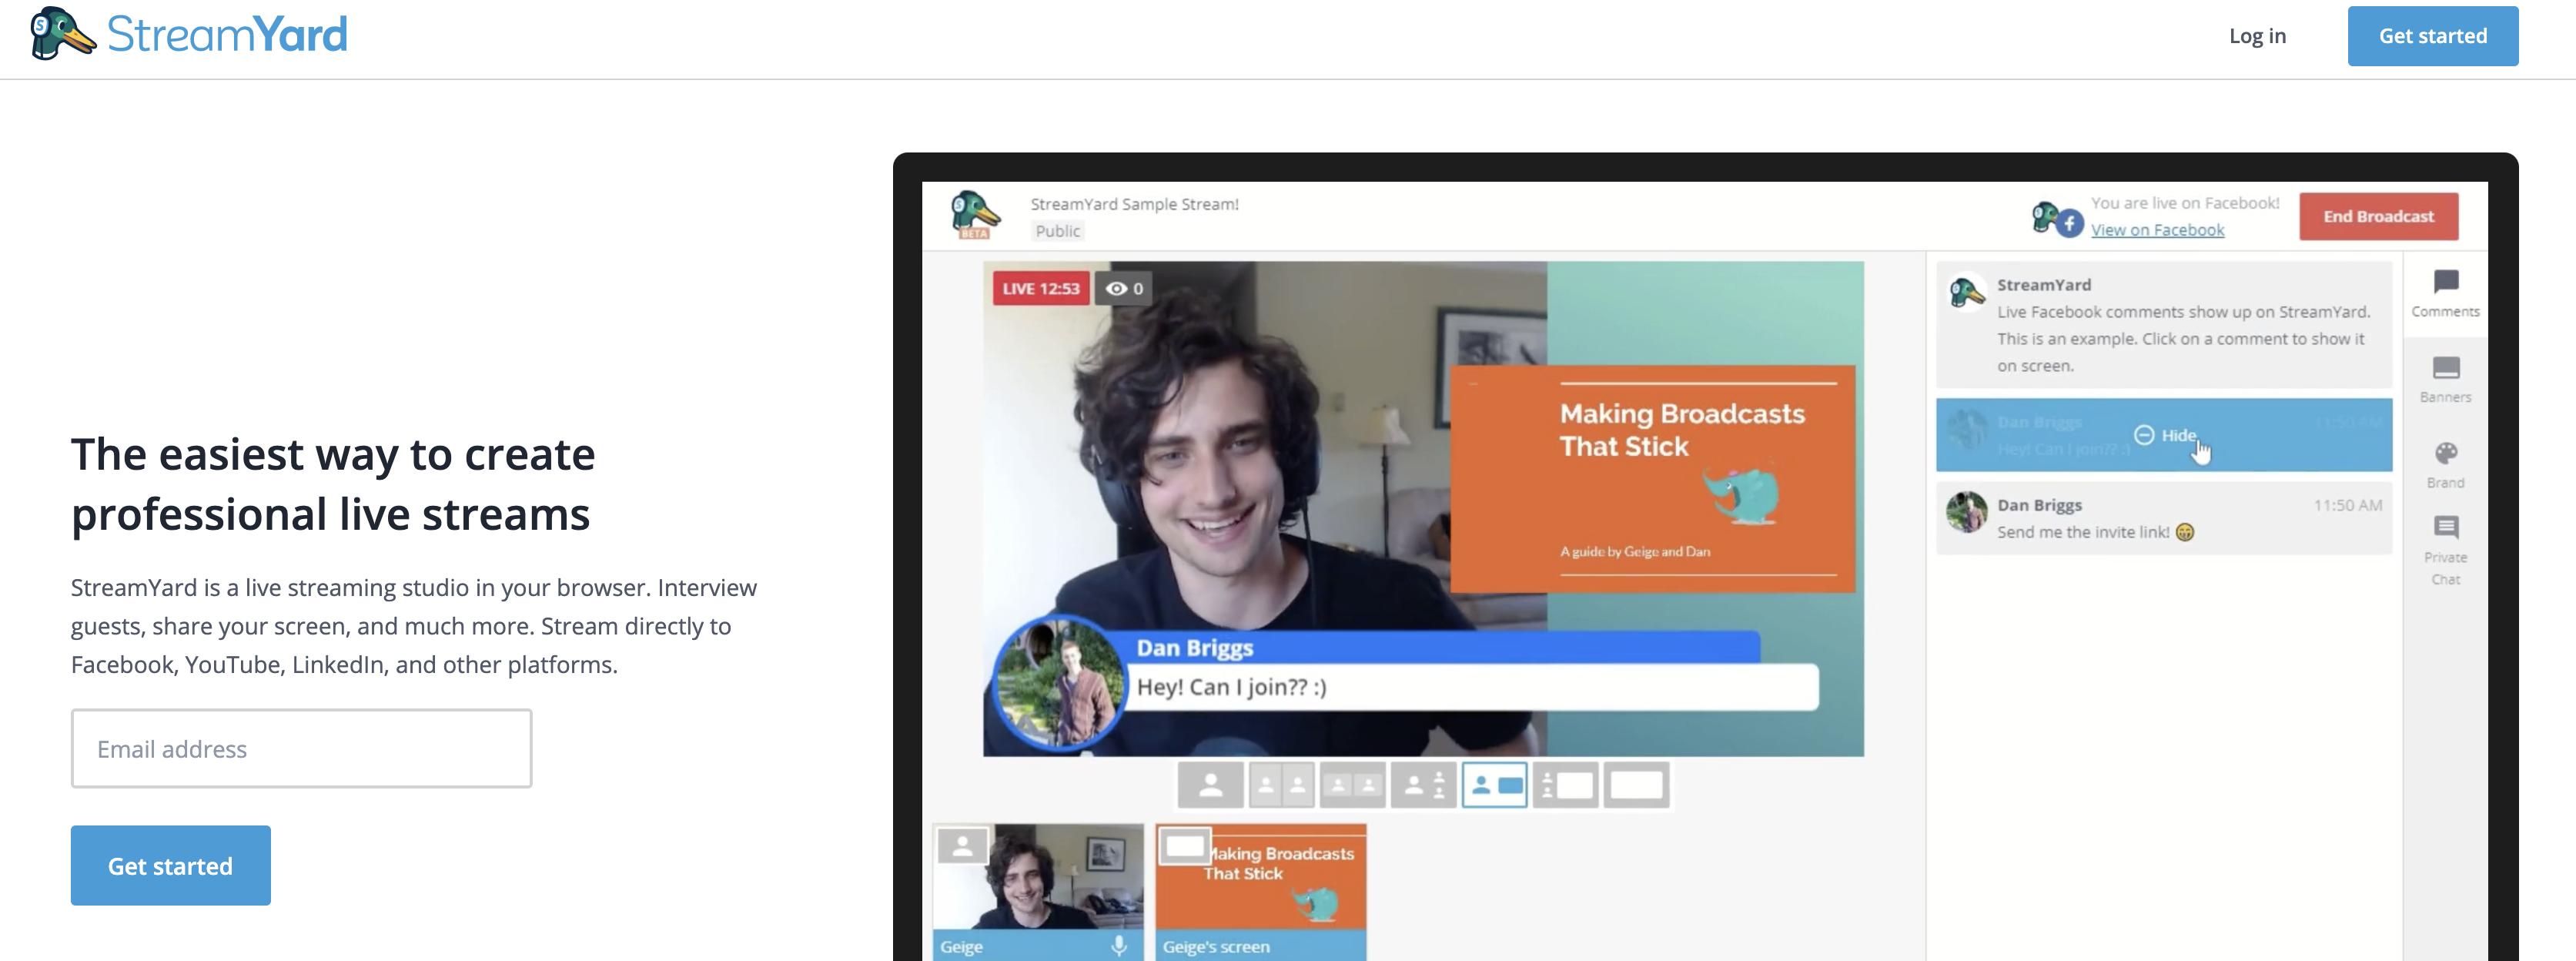 StreamYard homepage screenshot